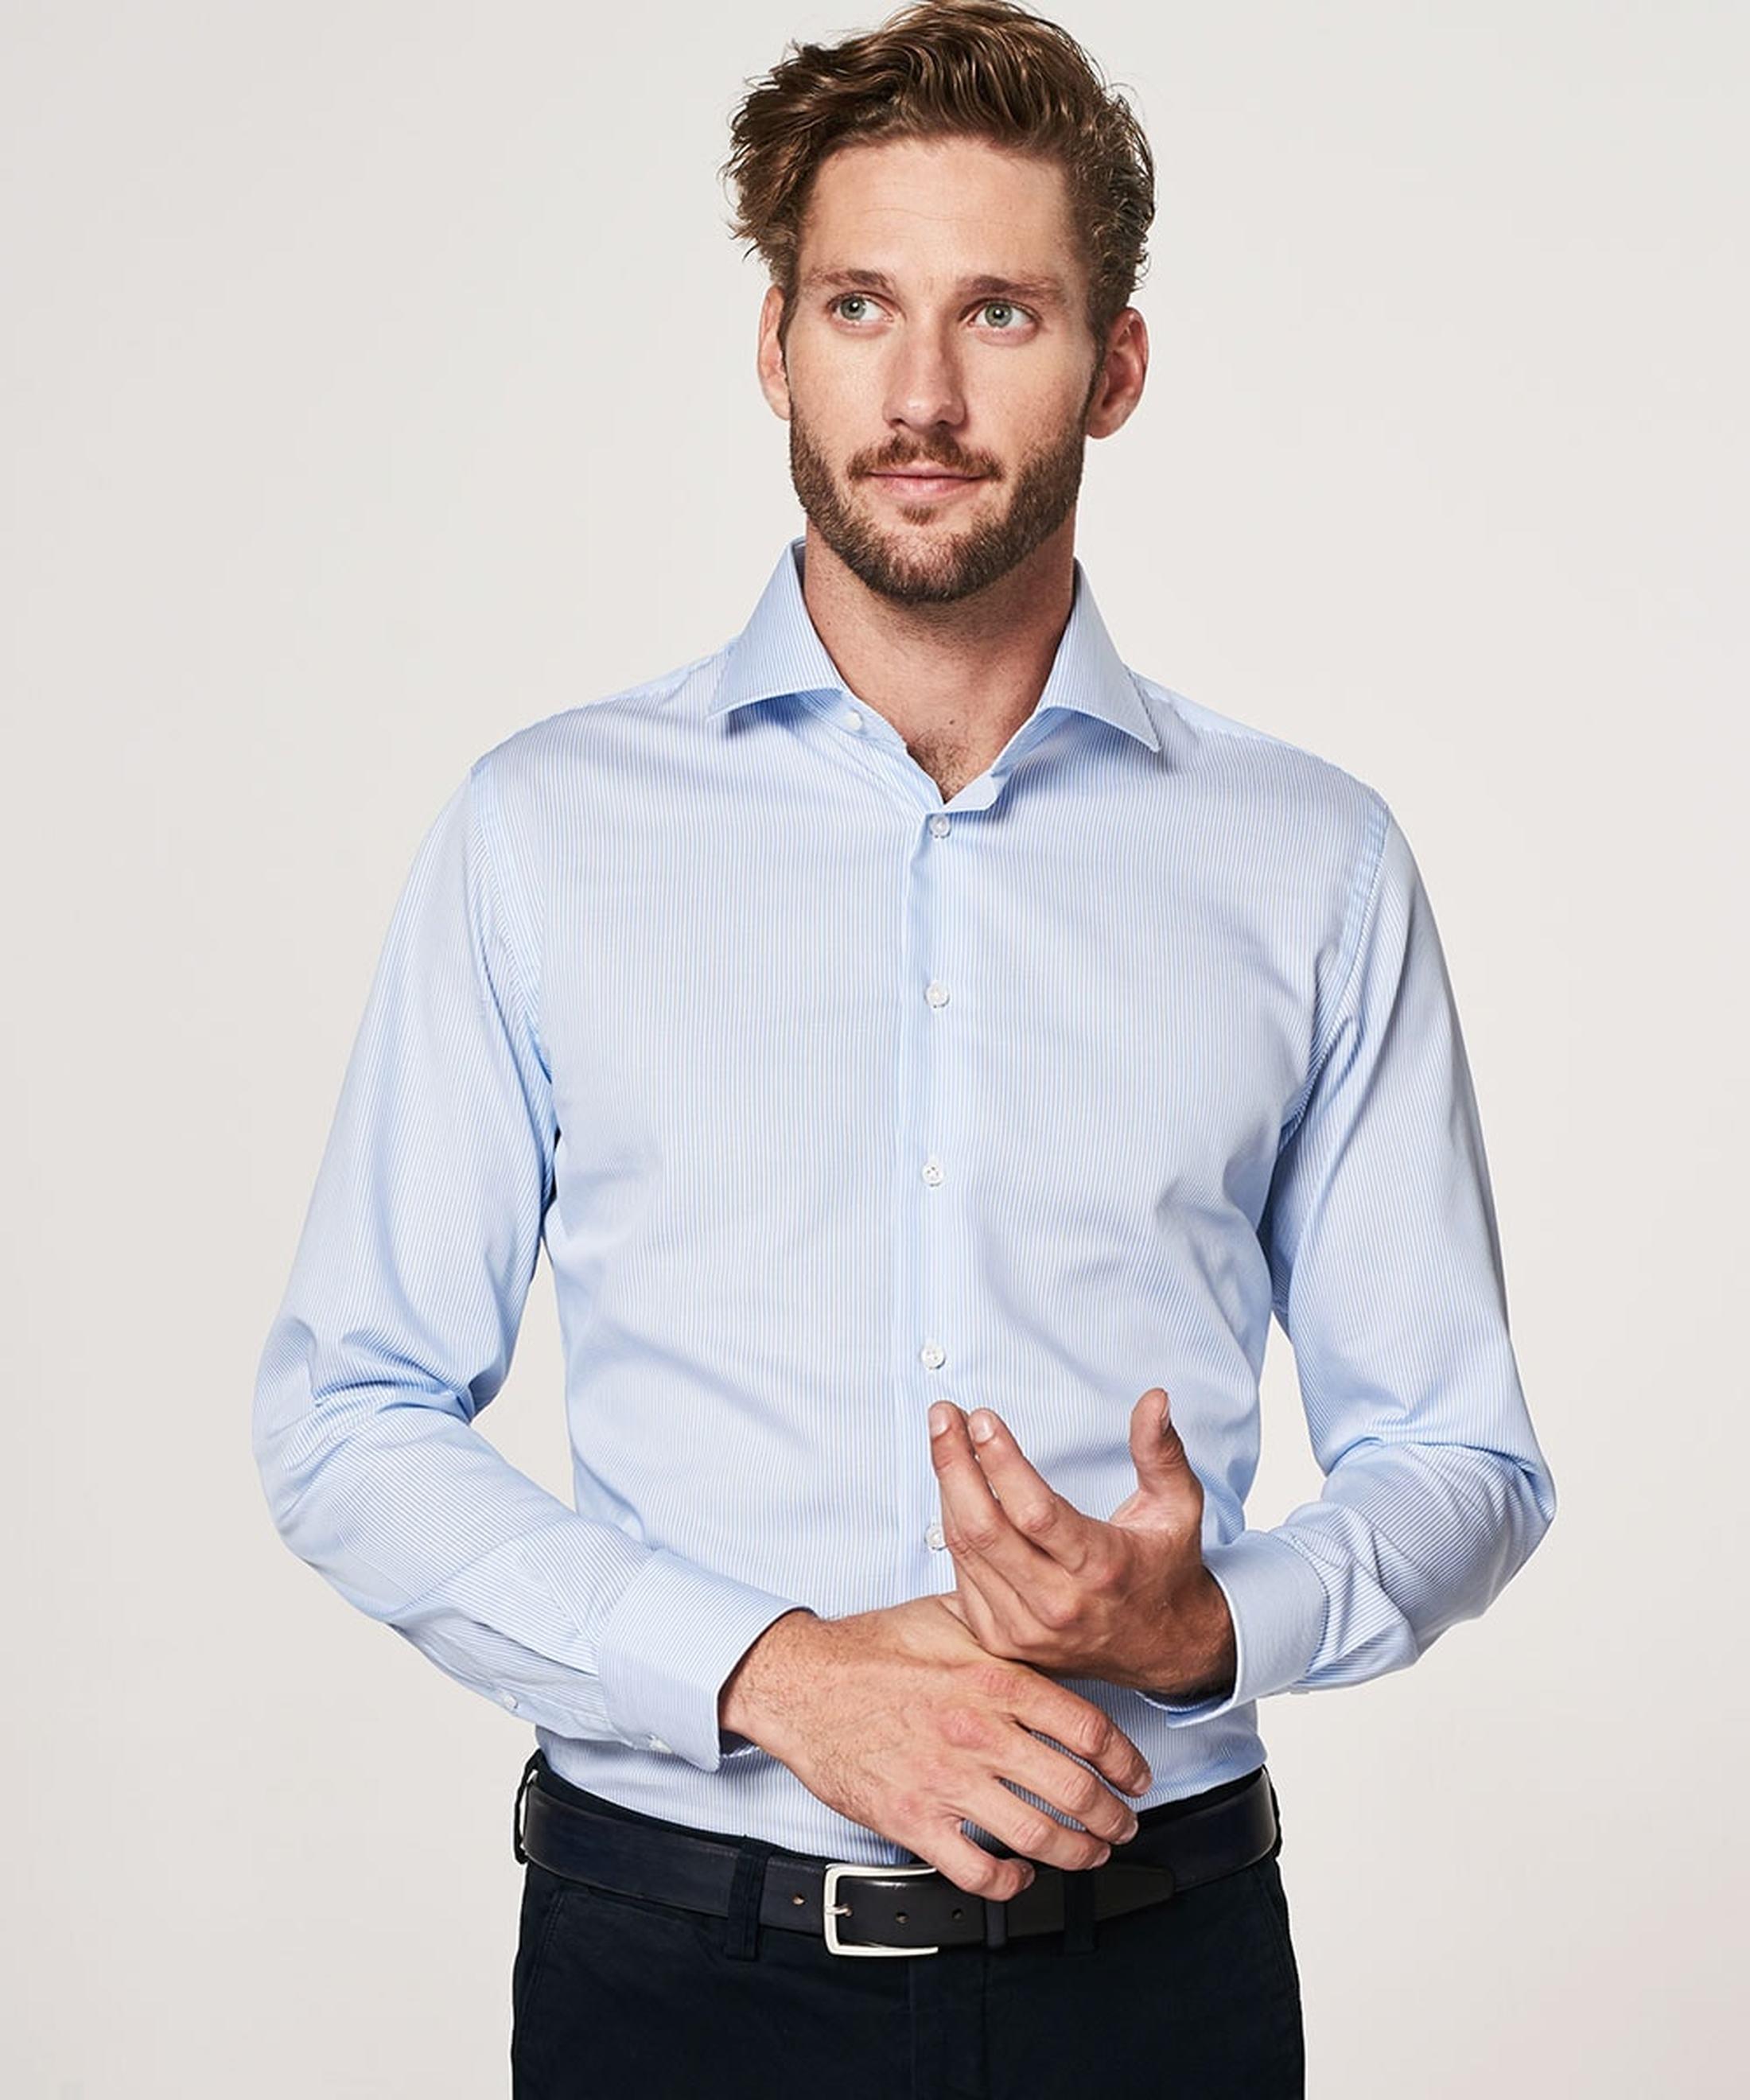 Profuomo Overhemd Lichtblauw Gestreept foto 3